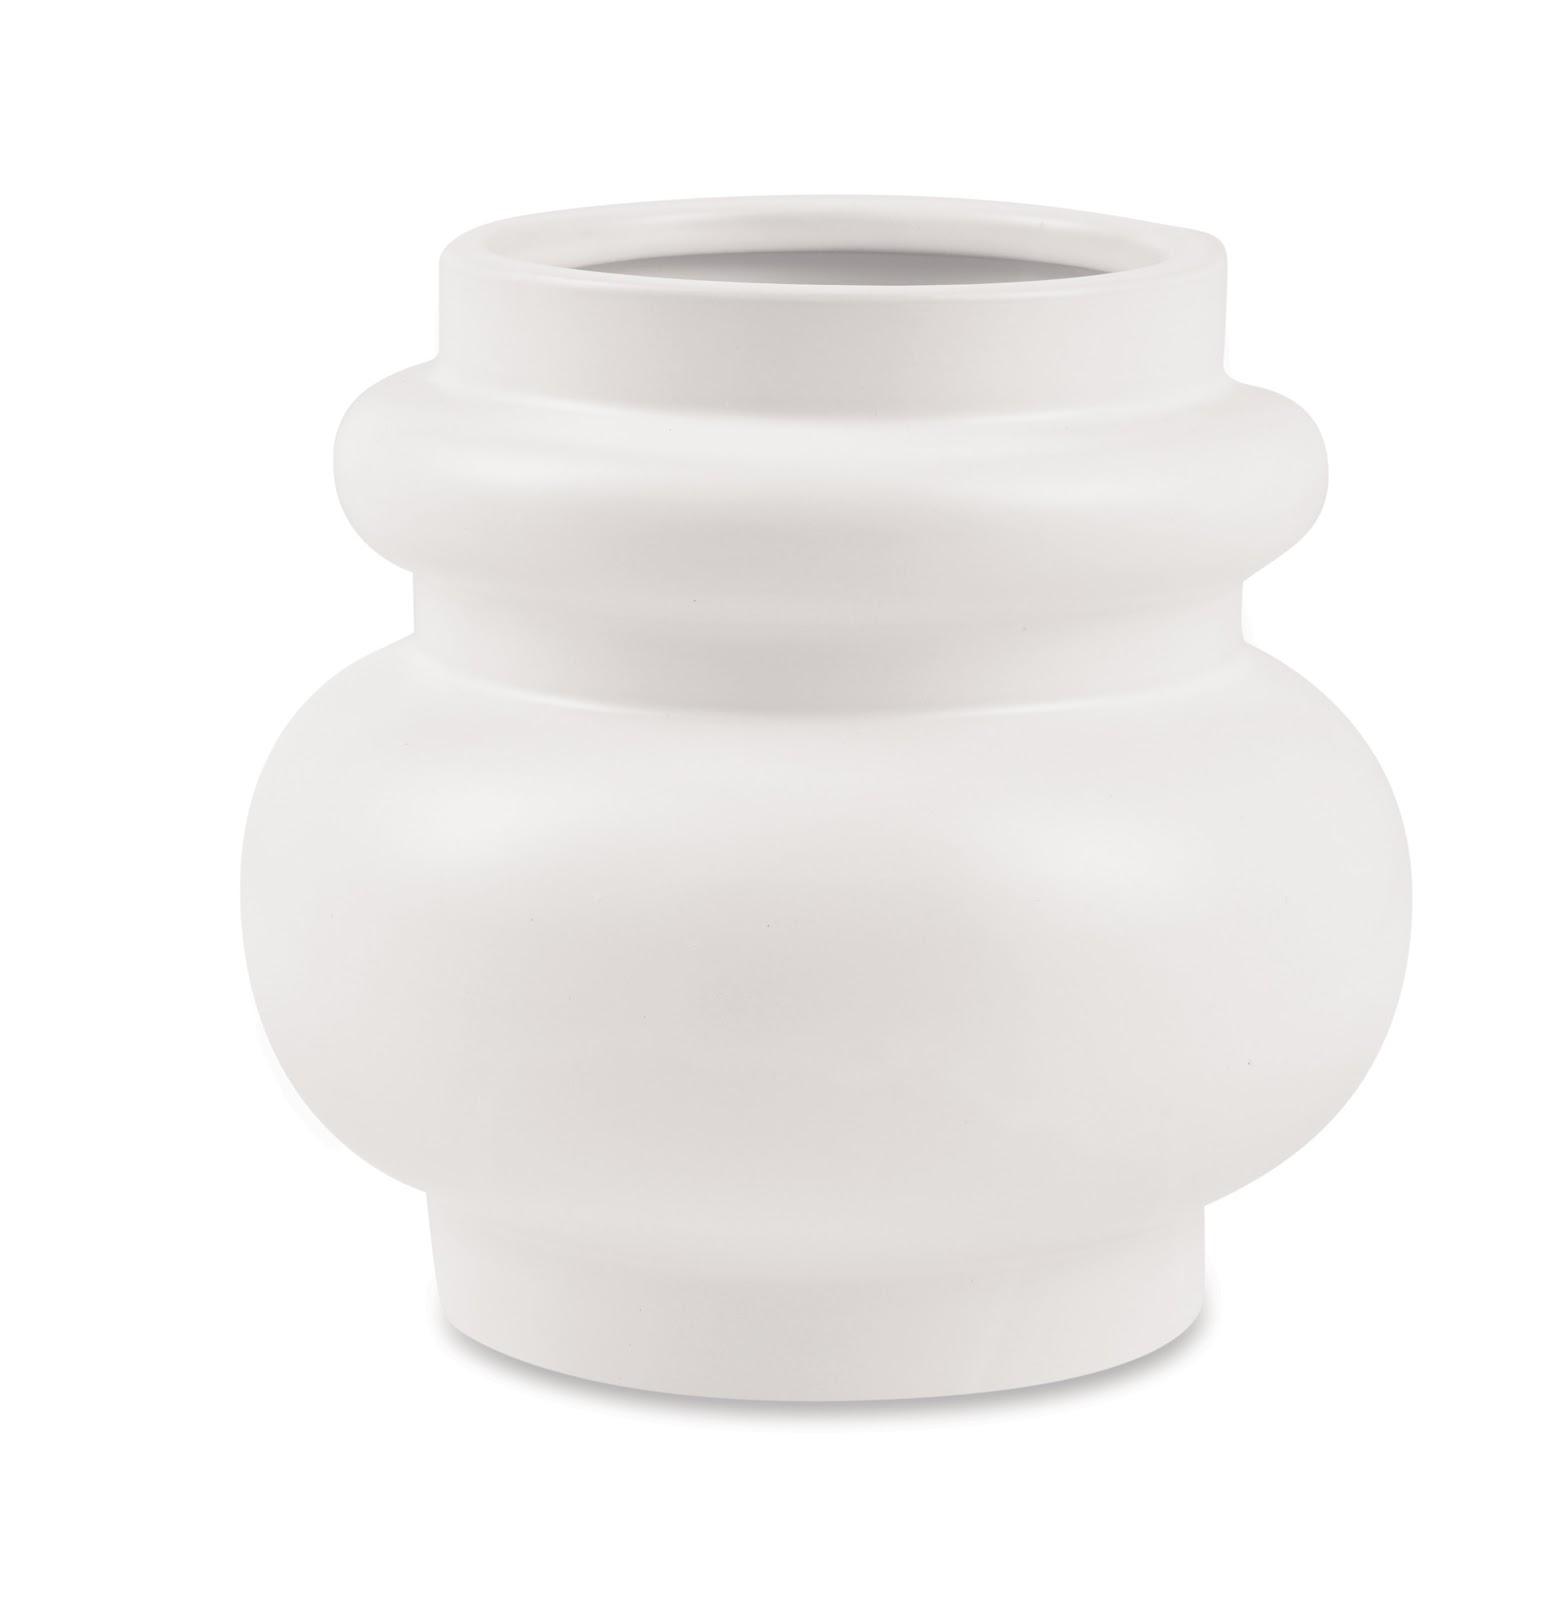 Vaso de Cerâmica Santorini Branco